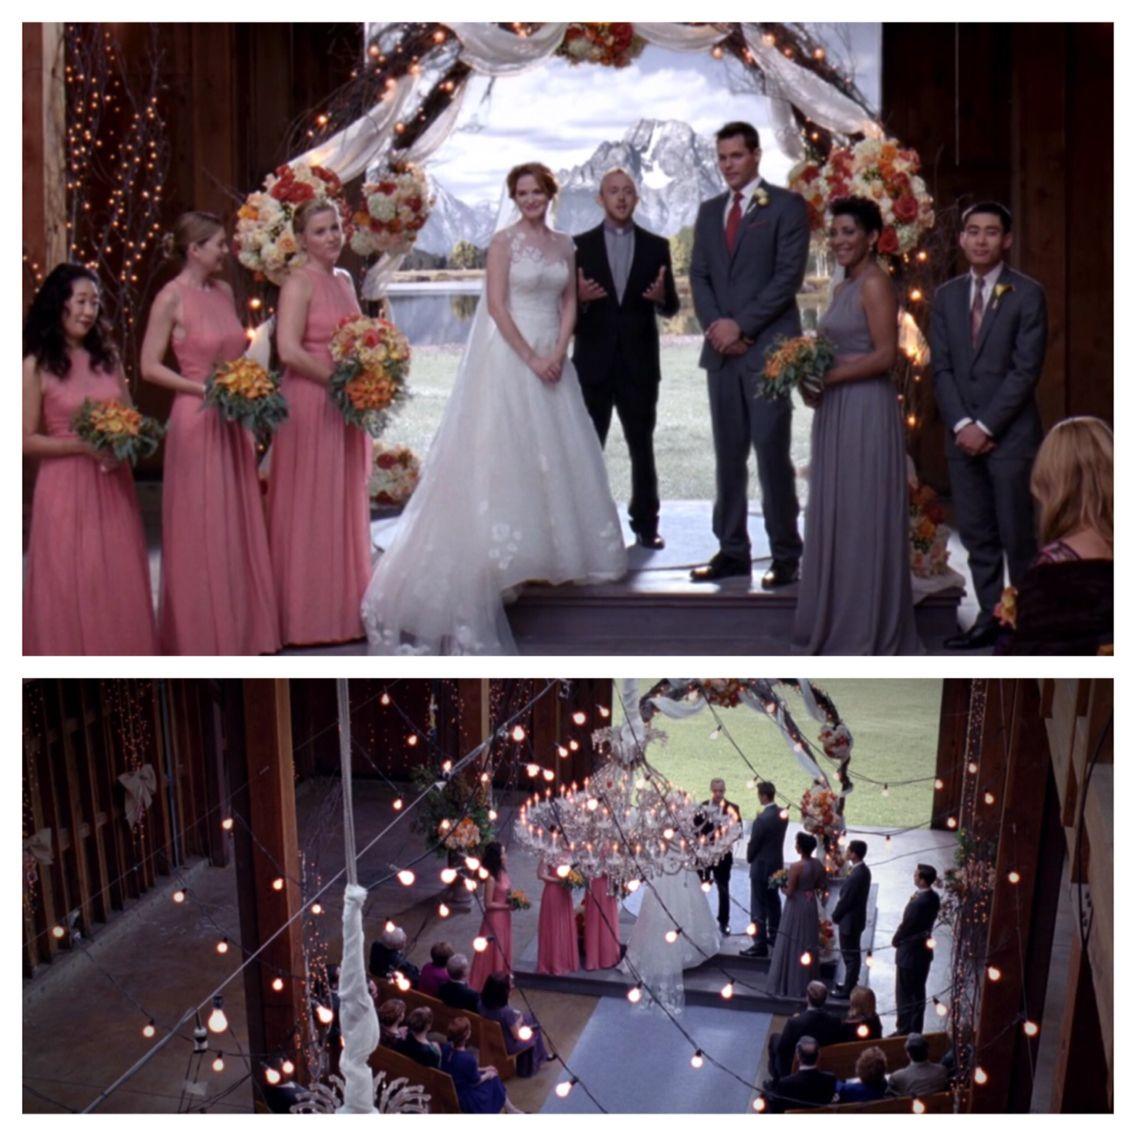 Greys Anatomy April Kepner S Wedding Wedding Movies